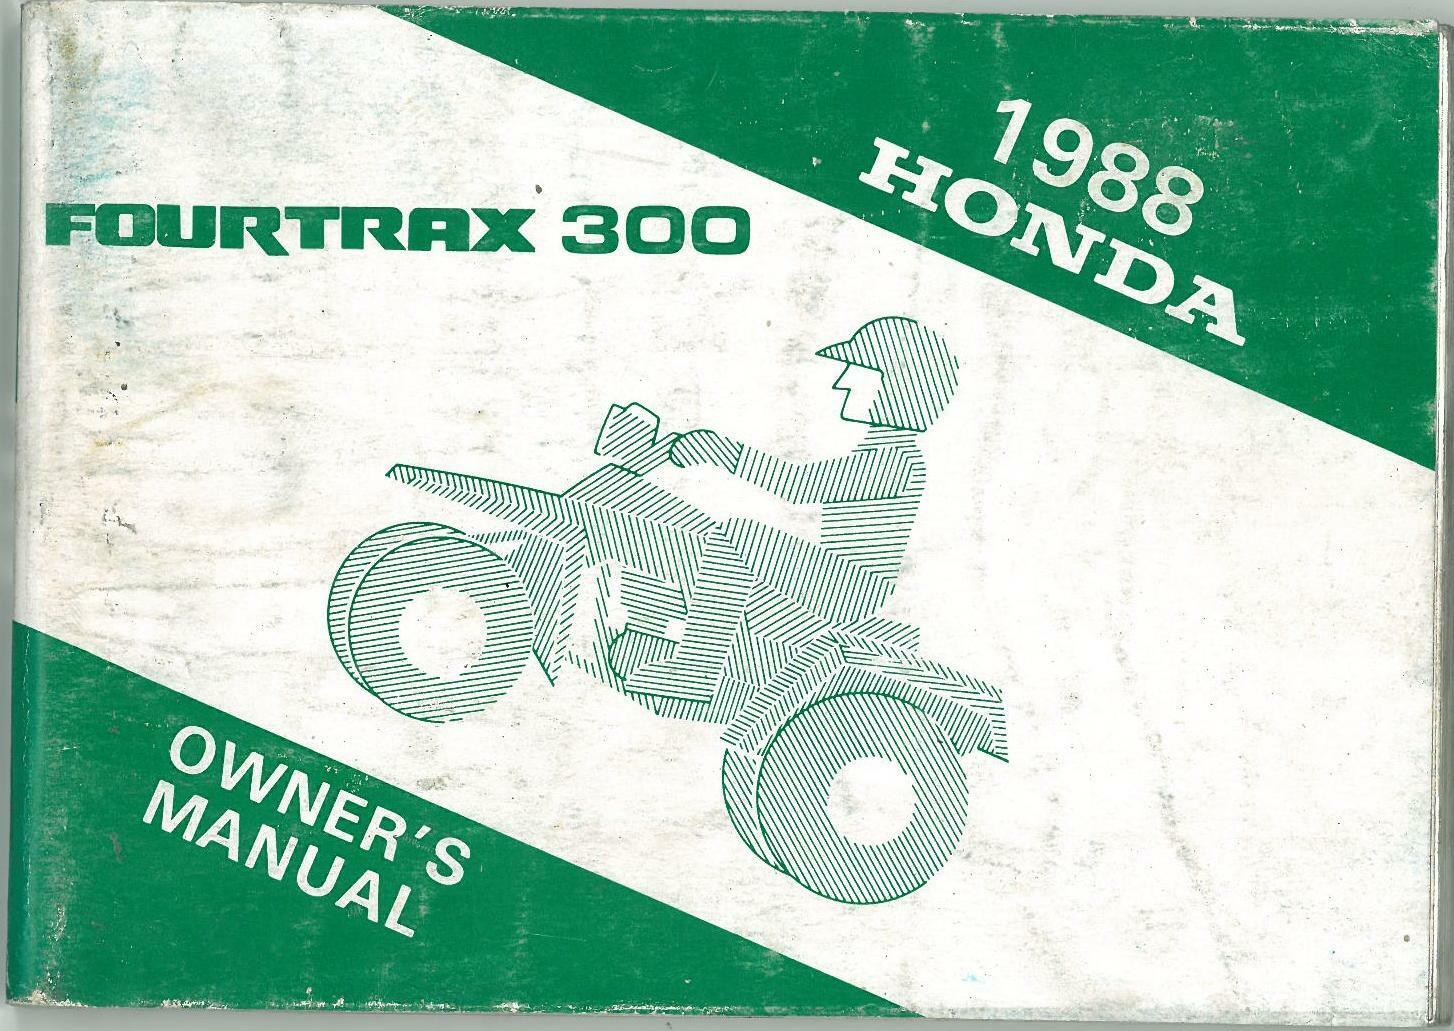 honda fourtrax 300 manual pdf